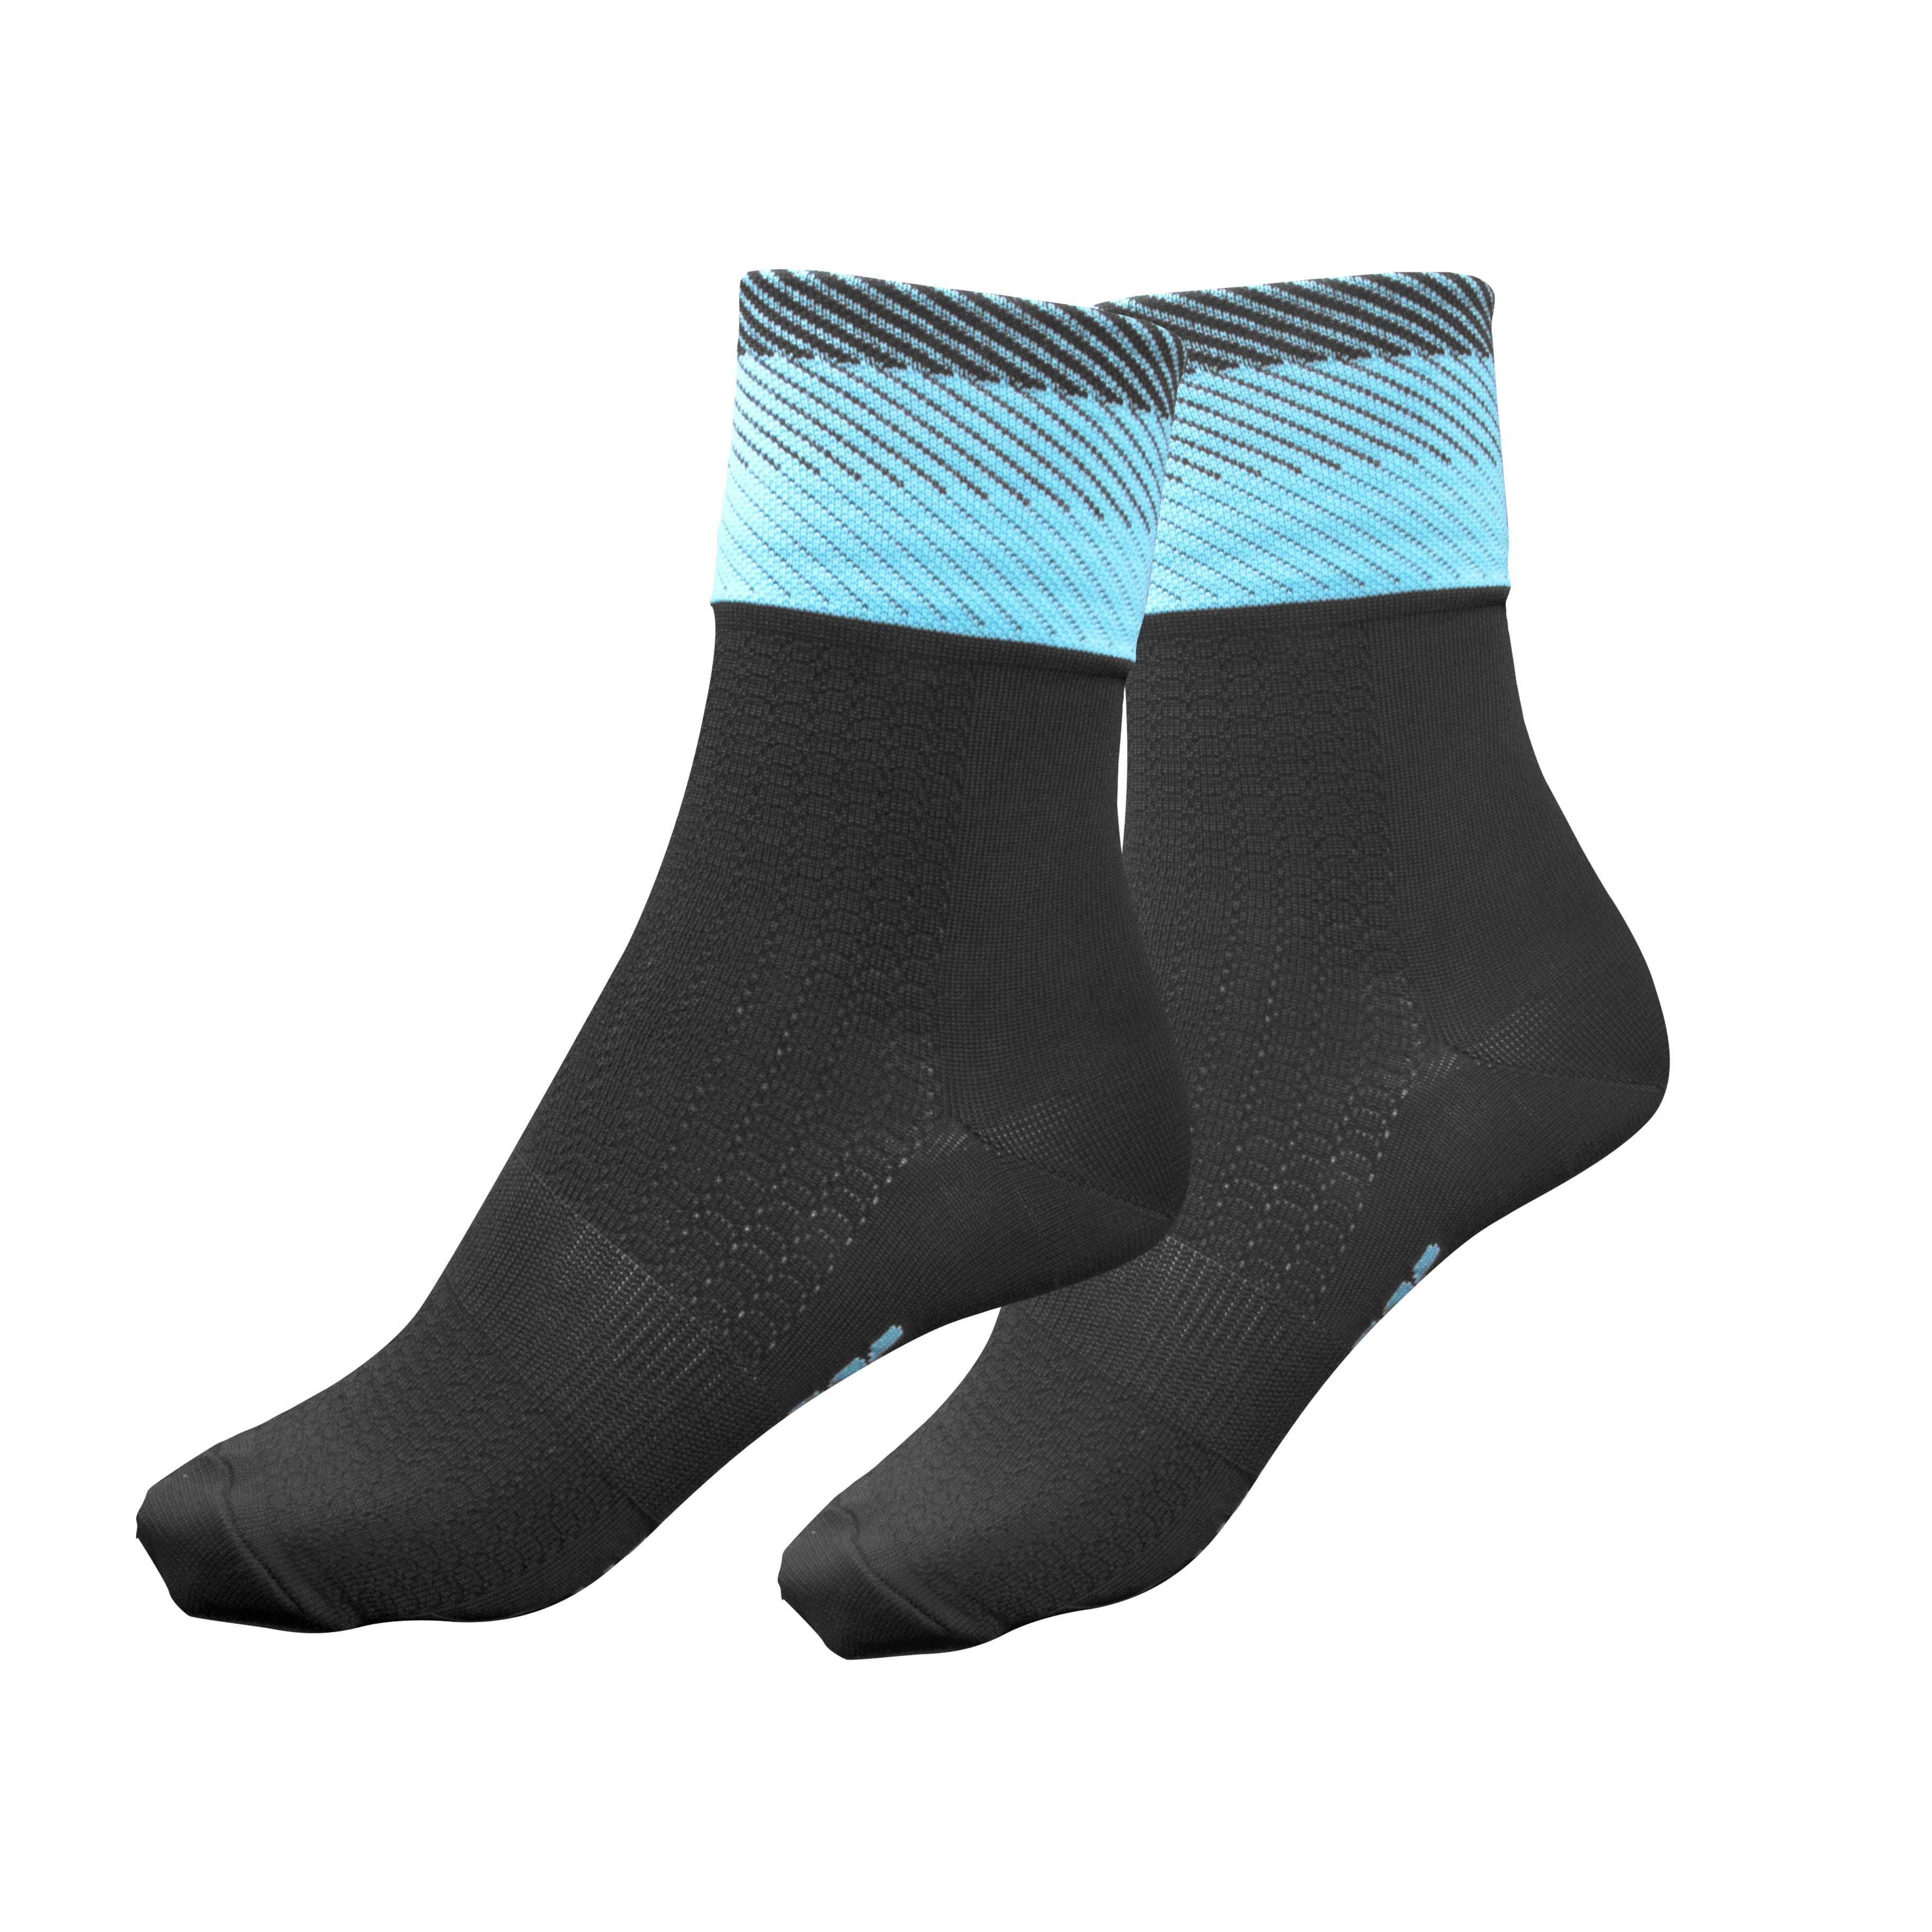 Chroma Socks Skinlife